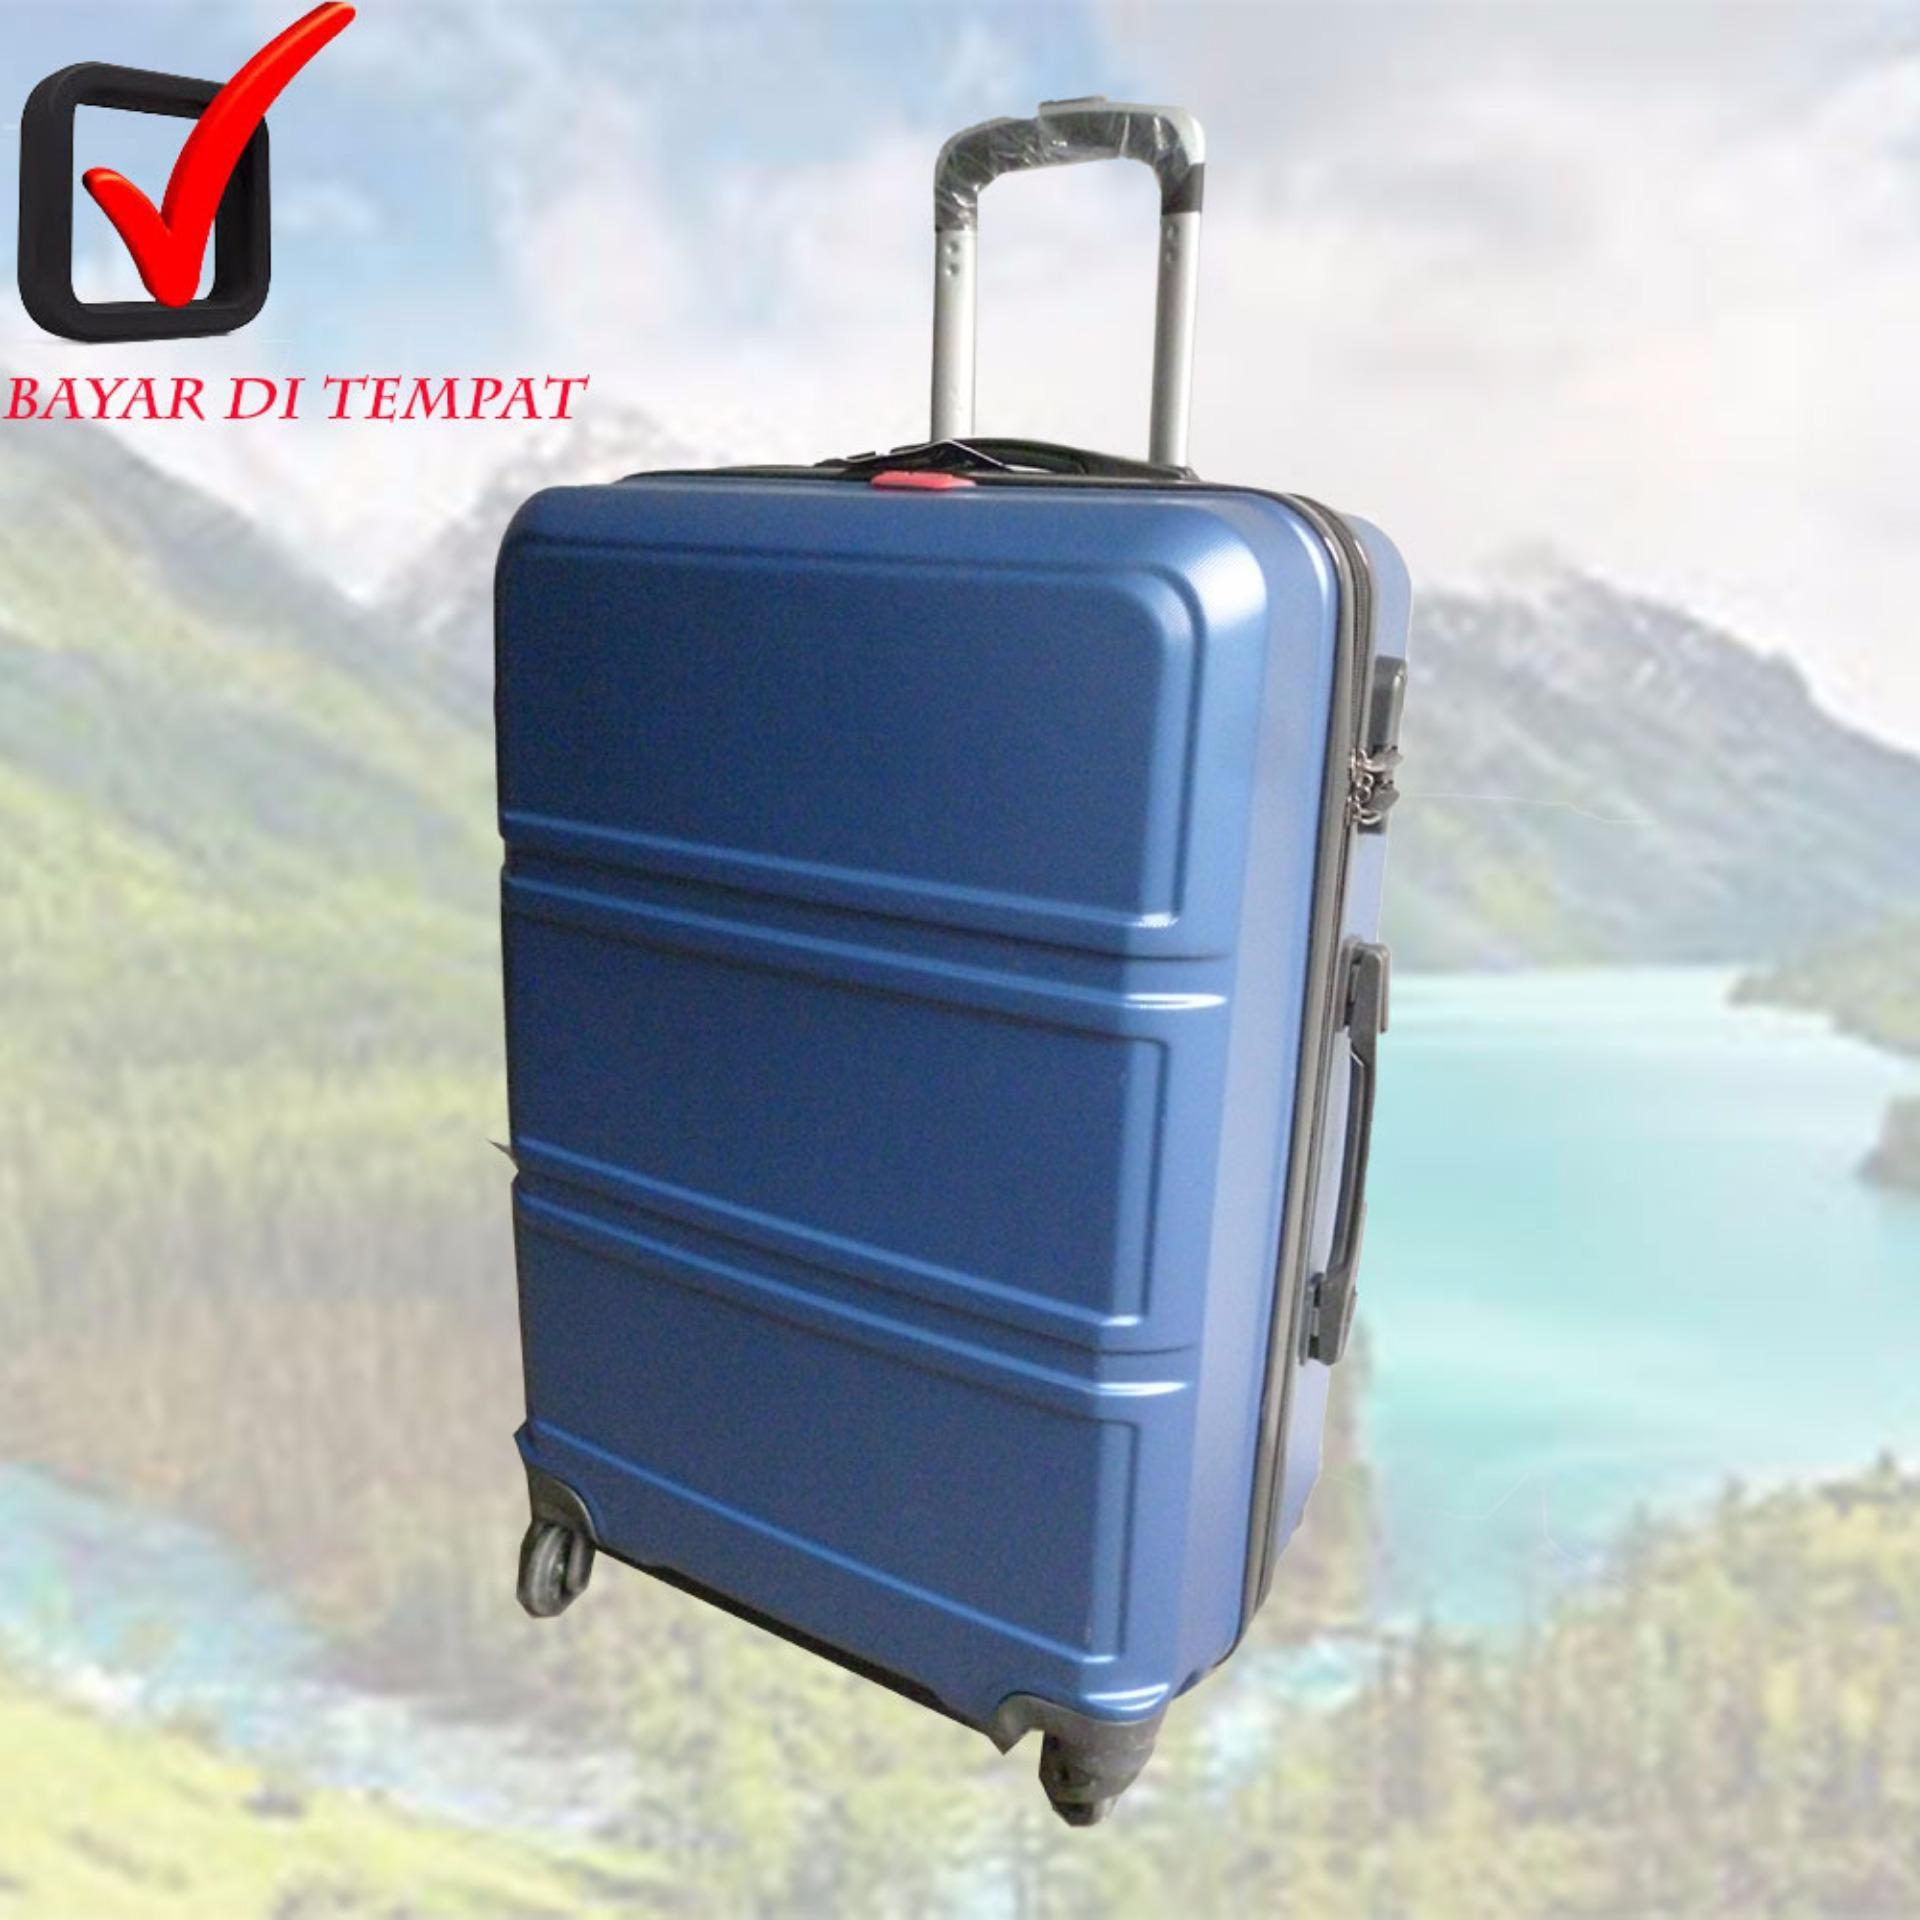 Kelebihan Polo Abs Koper Milano 20 Inch Premium Quality Pg12332 Tas Hoby Fiber Kabin Size 705 Silver Promo Pg 23443 24